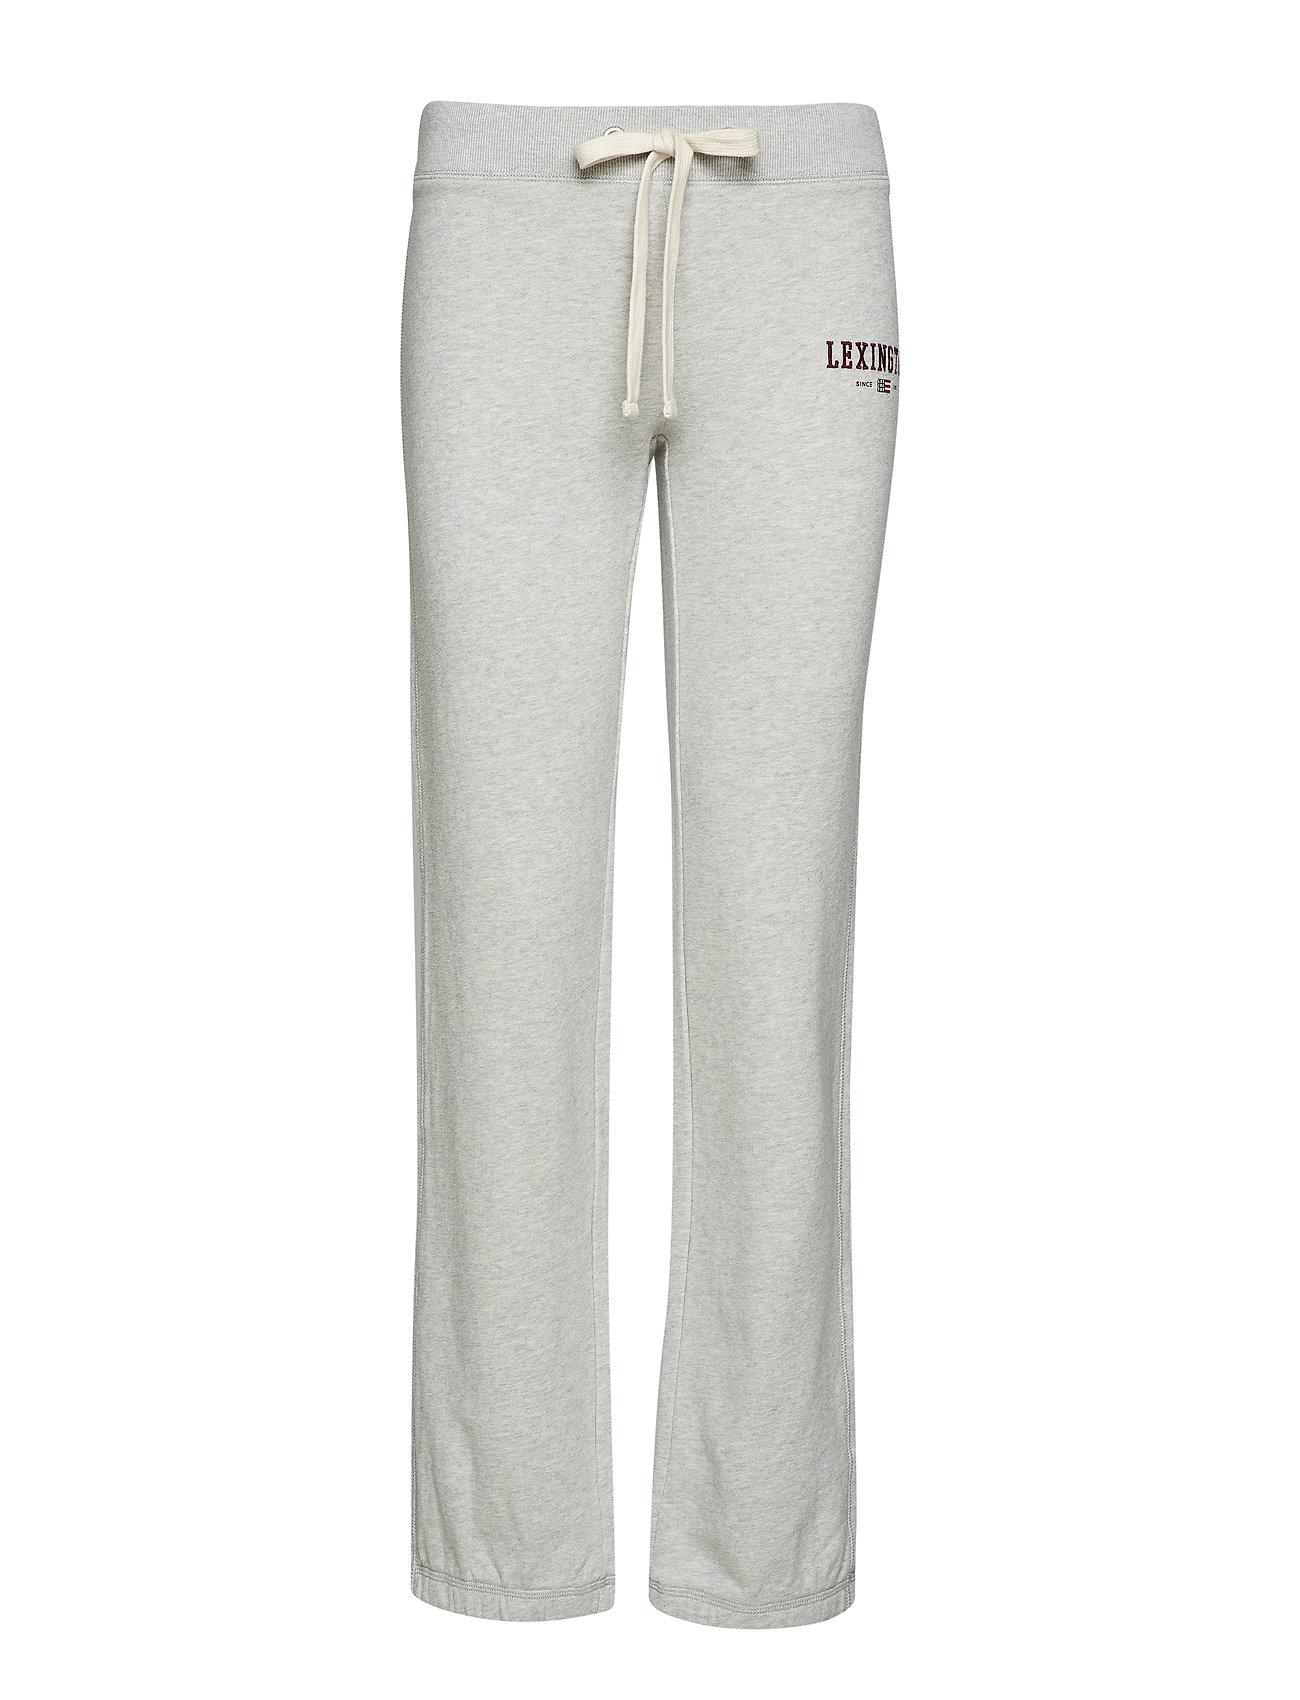 Lexington Clothing Jenna Pants